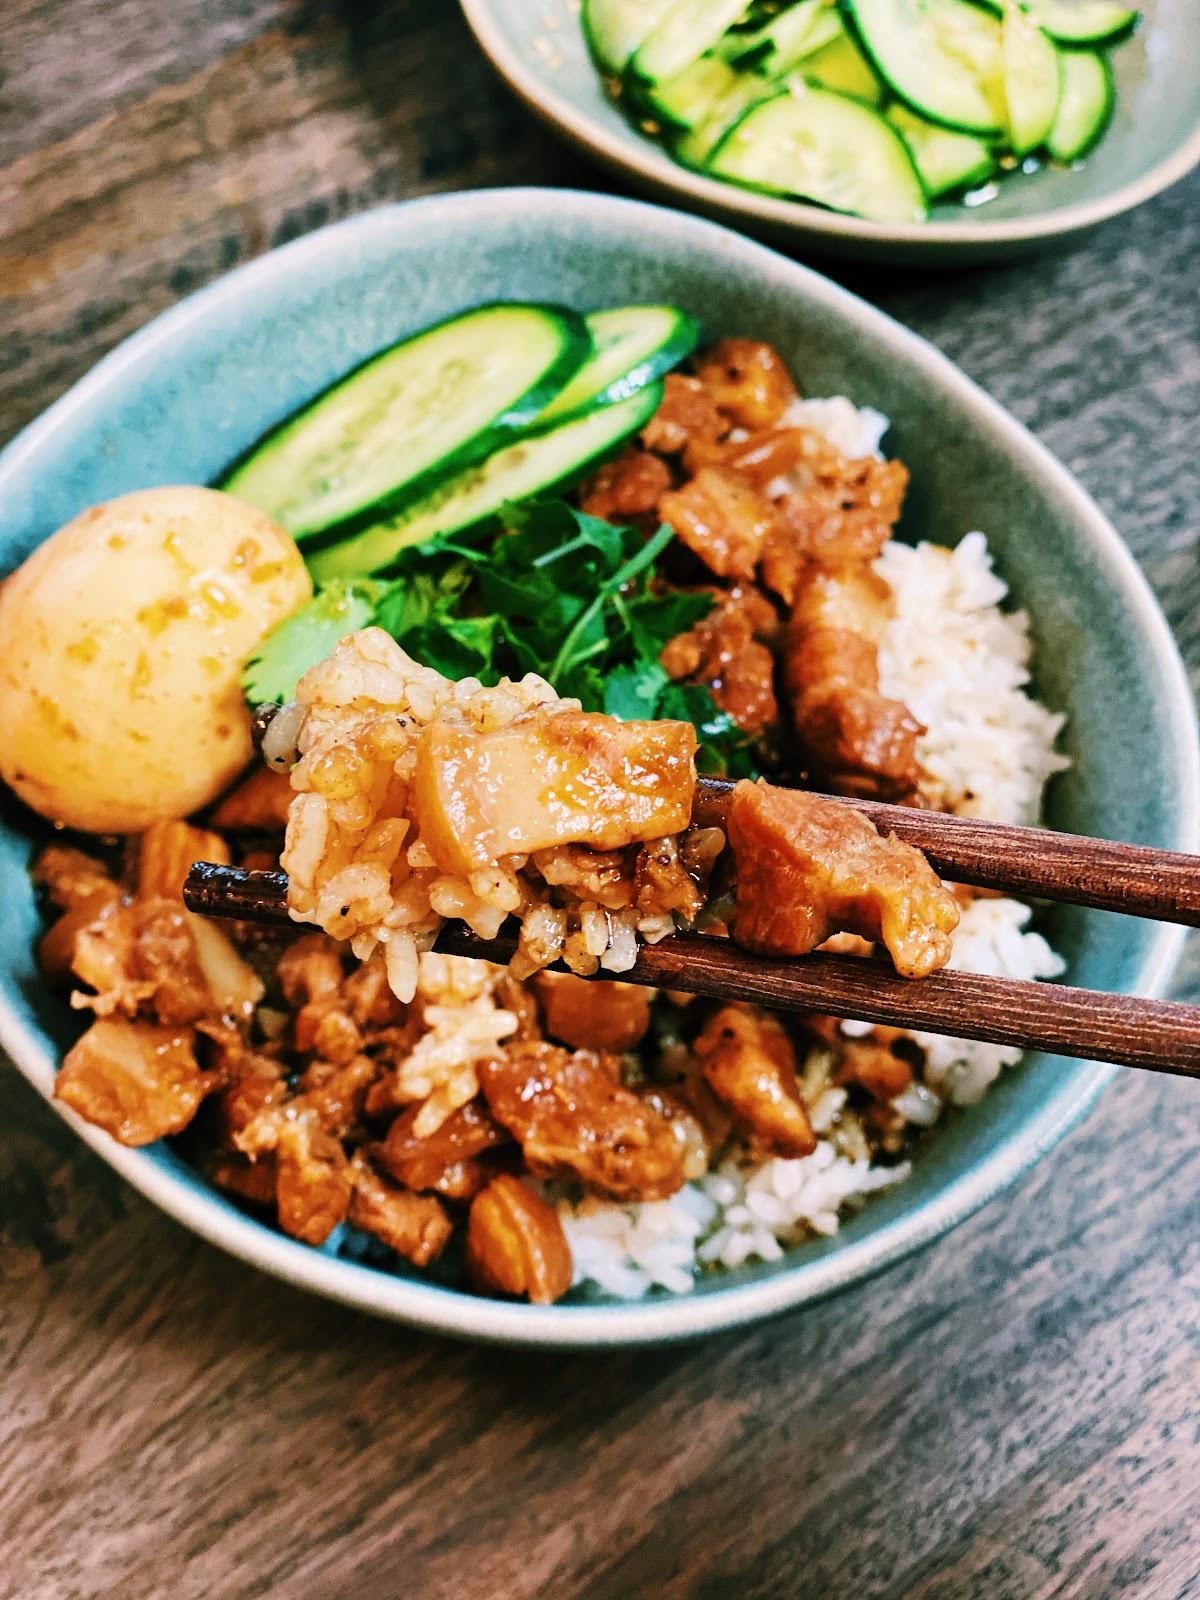 Pork belly rice